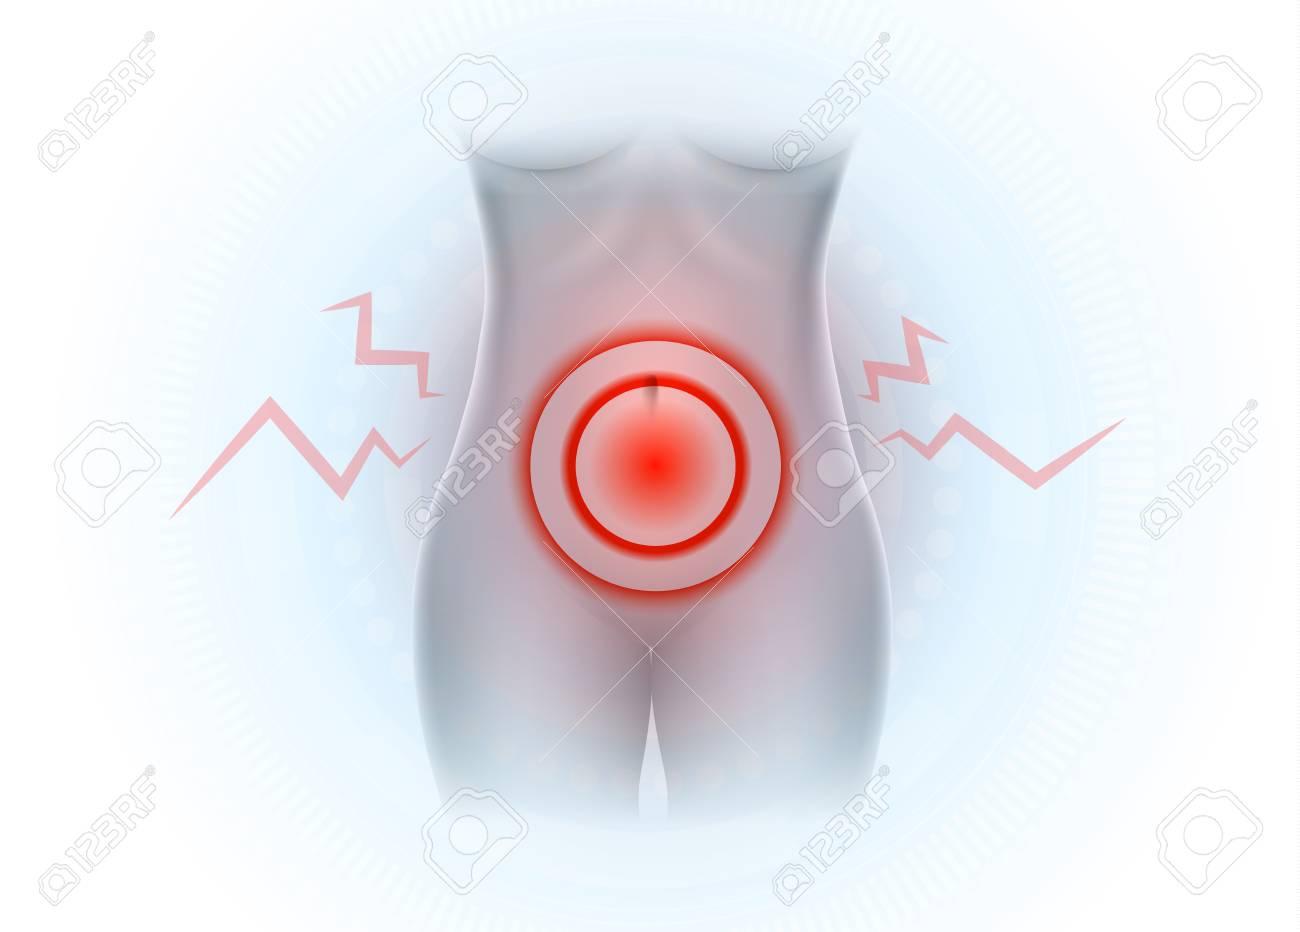 Female Lower Abdominal Pain Pelvic Pain Royalty Free Cliparts